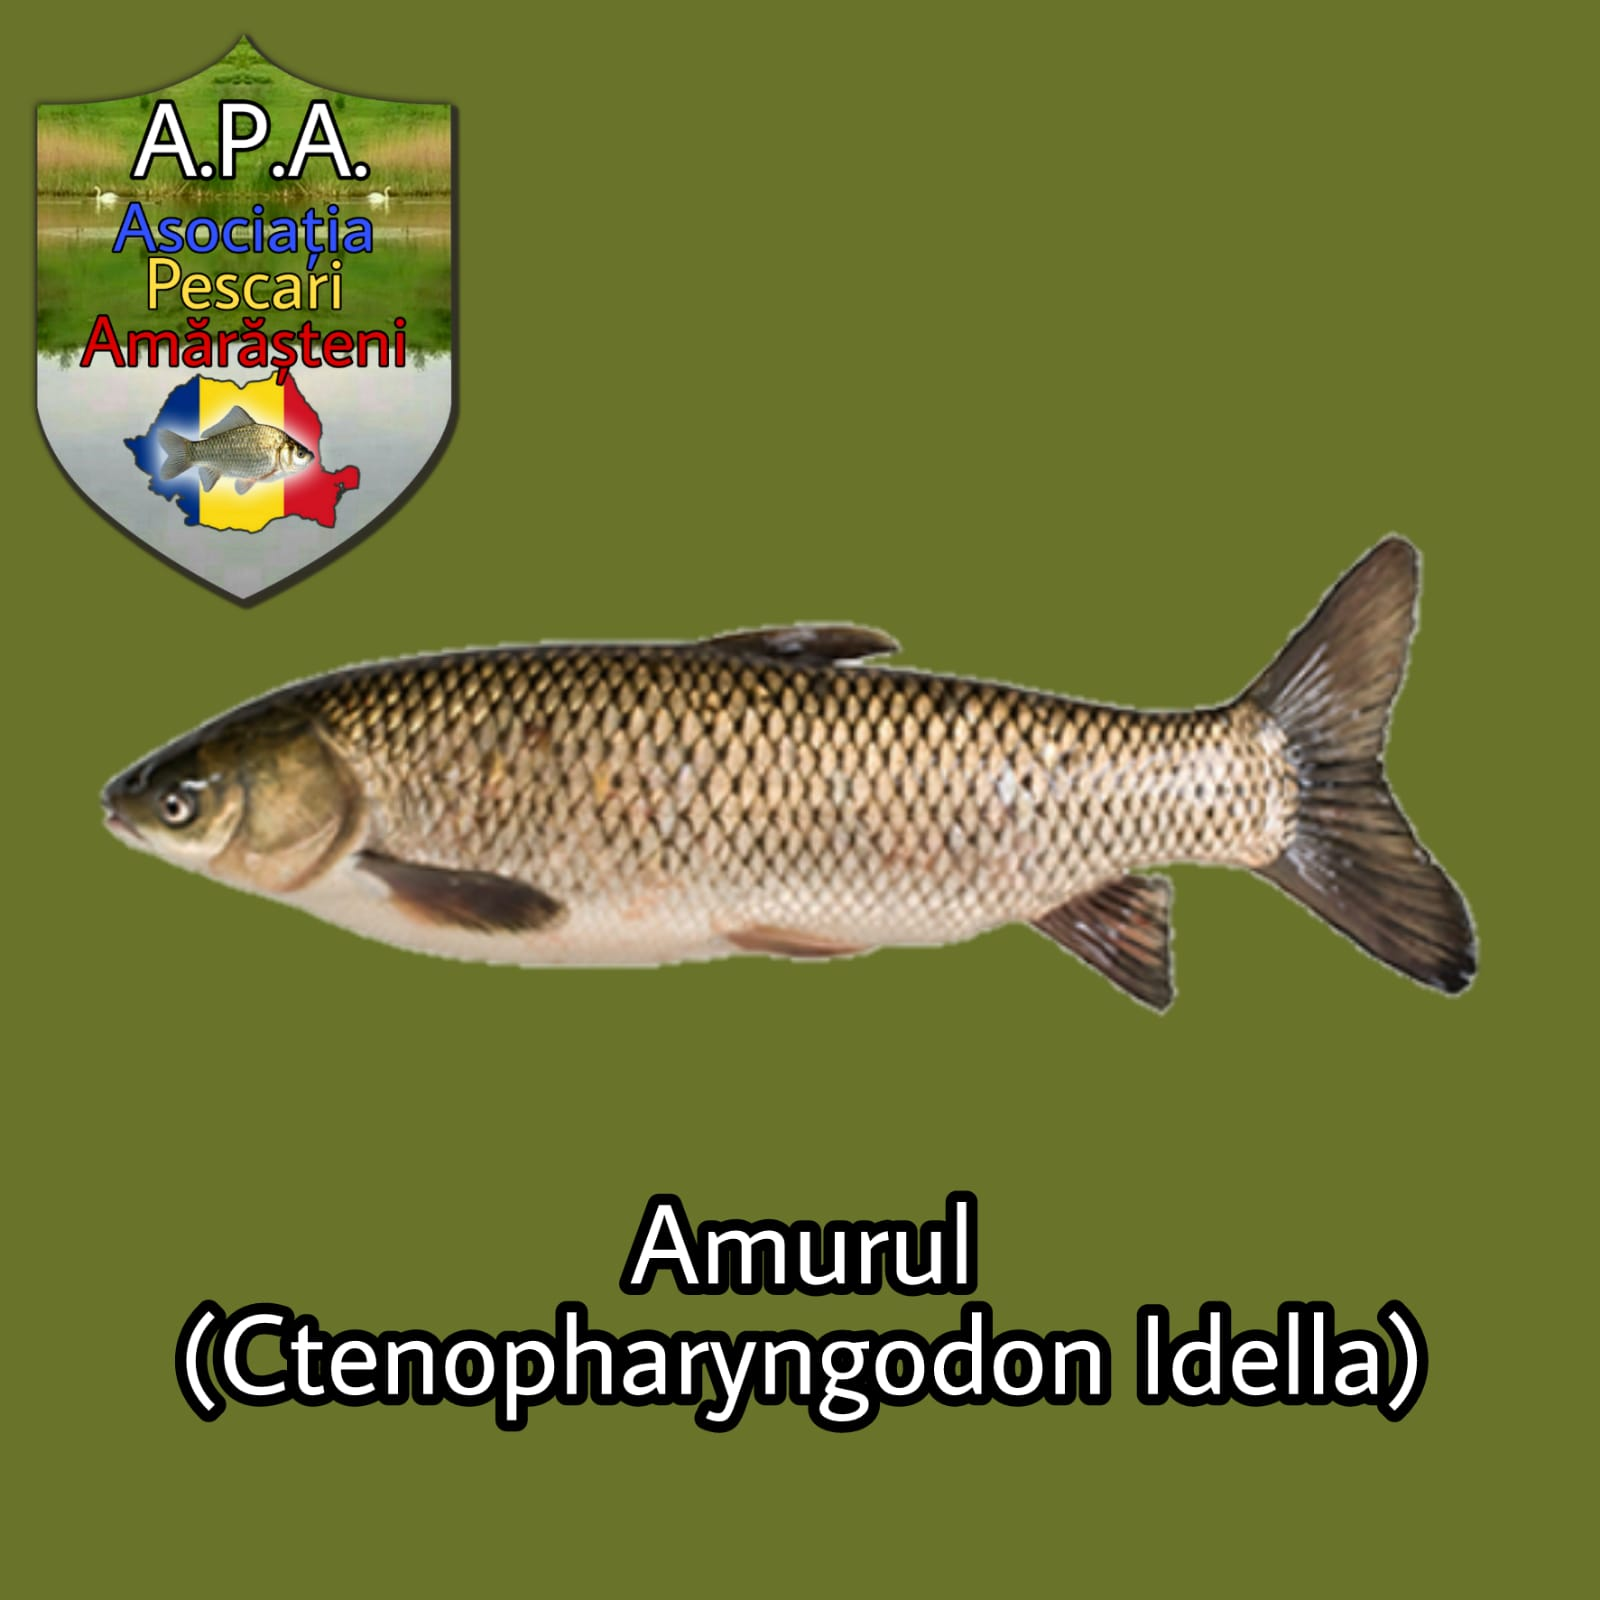 Amurul (Ctenopharyngodon idella)